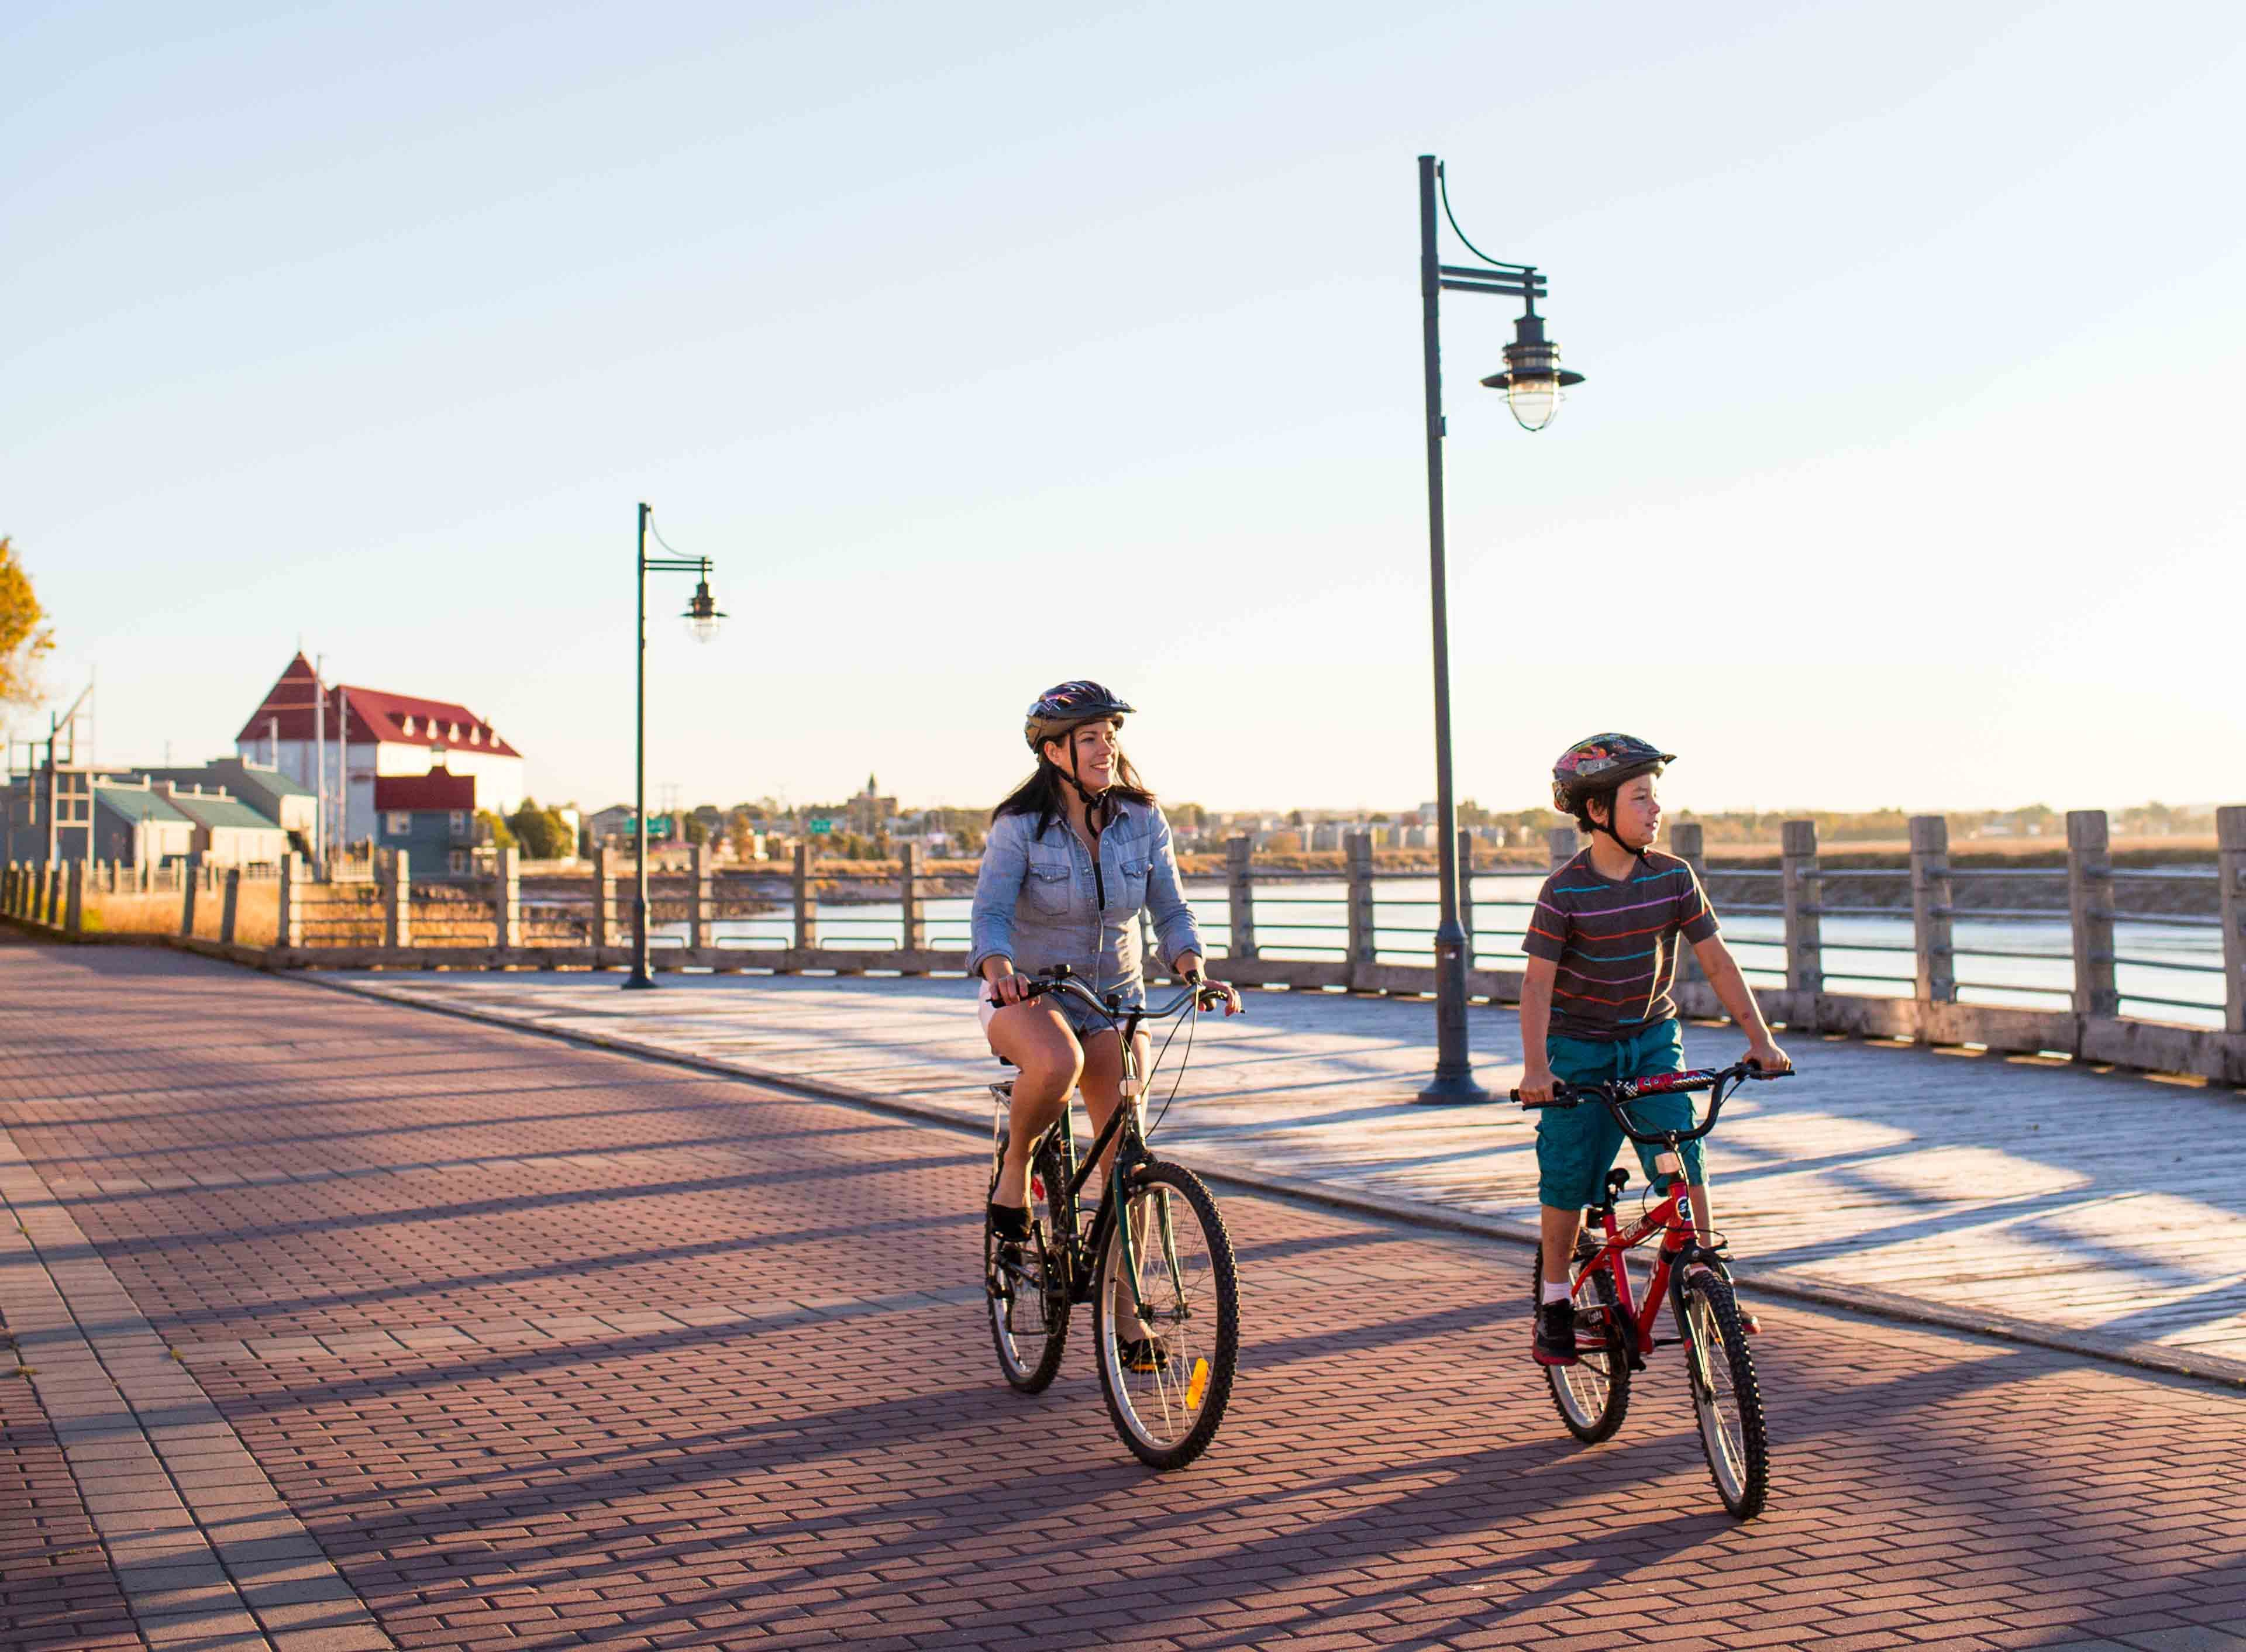 Riverfront Trail and boardwalk